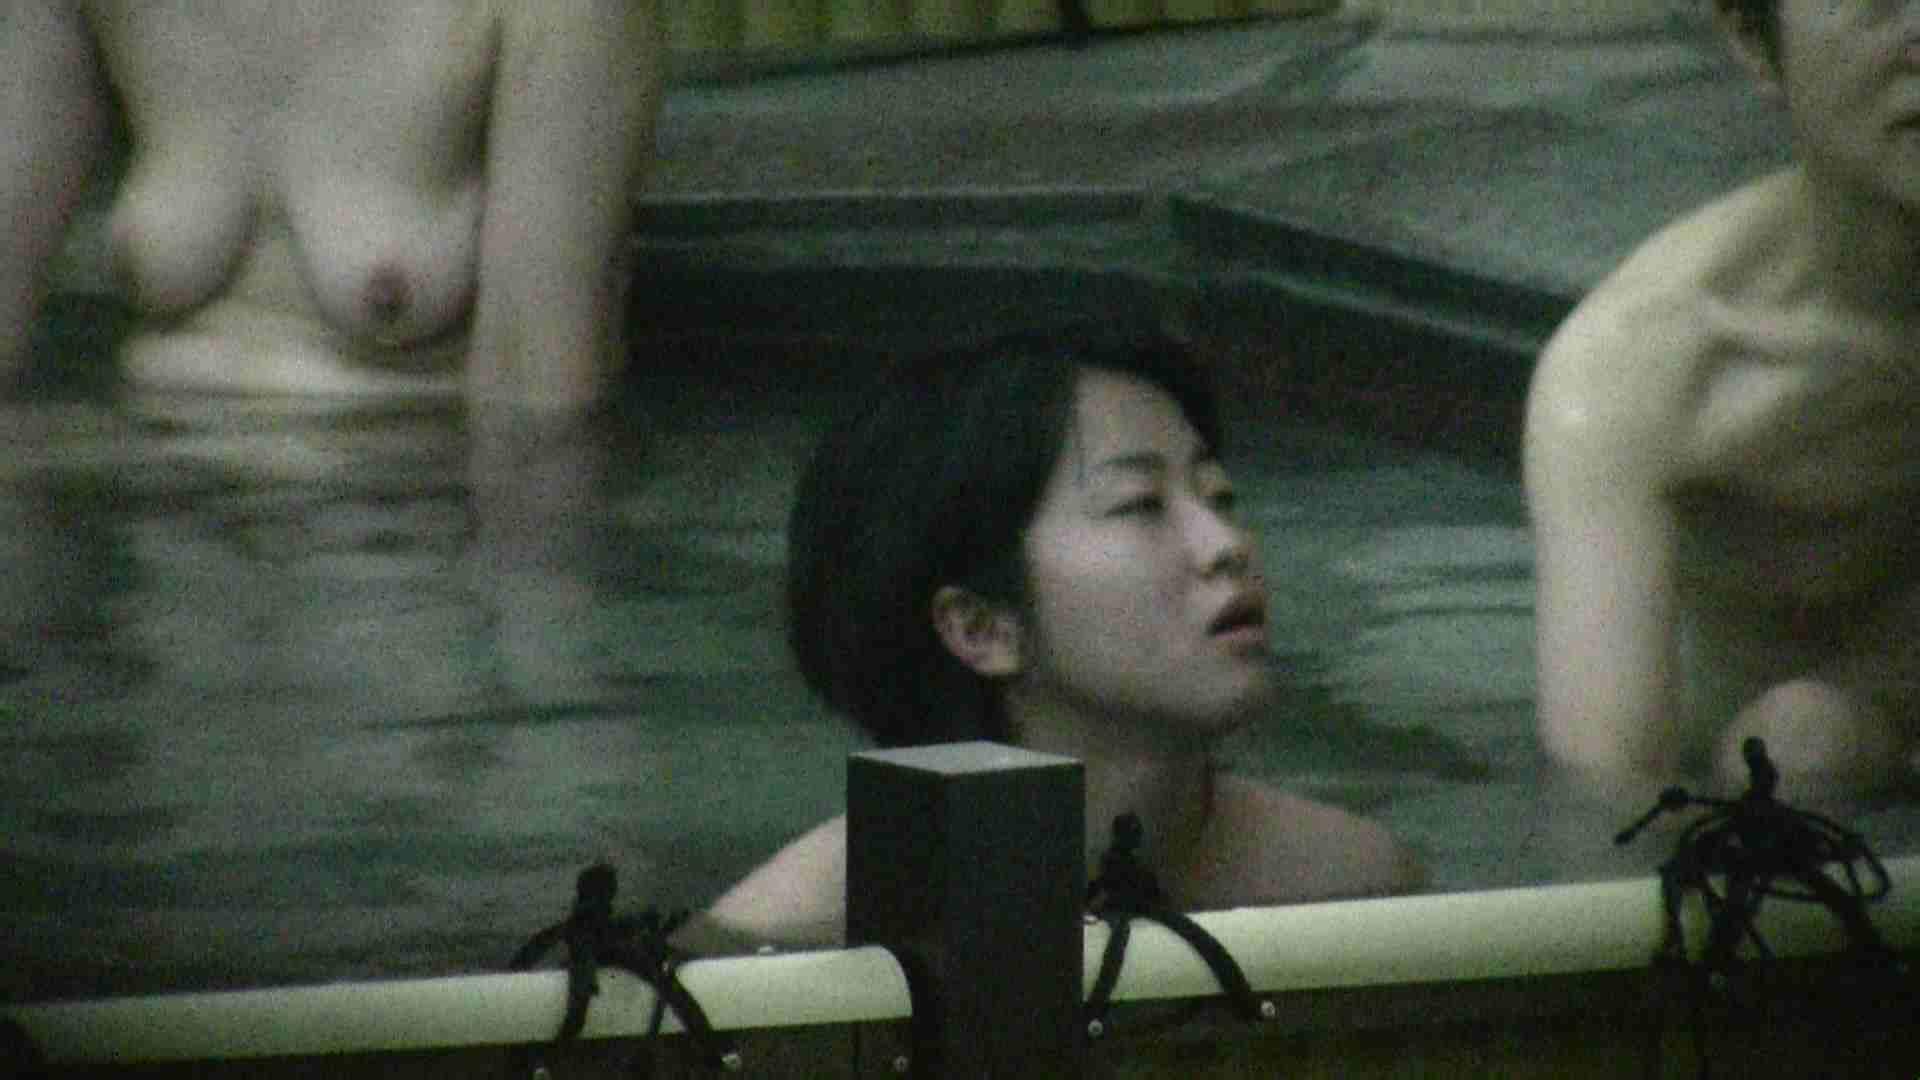 Aquaな露天風呂Vol.112 盗撮シリーズ   露天風呂編  93PIX 91